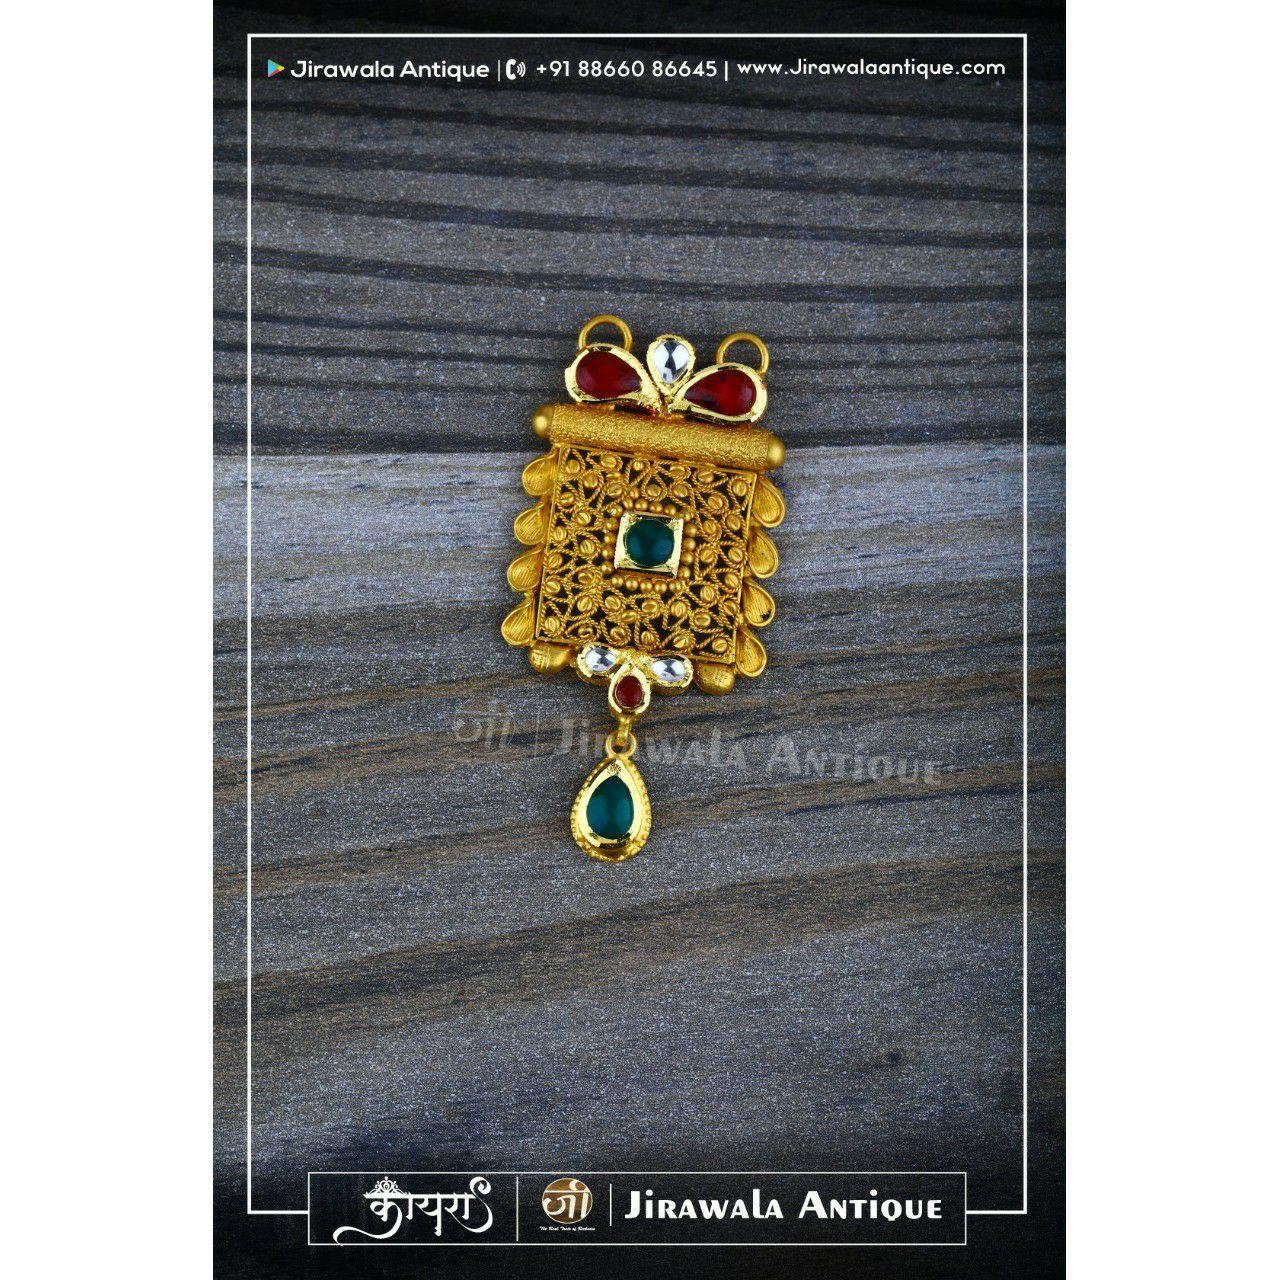 Antique Jadtar Mangalsutra Pendant with Green White Kundan Combination.